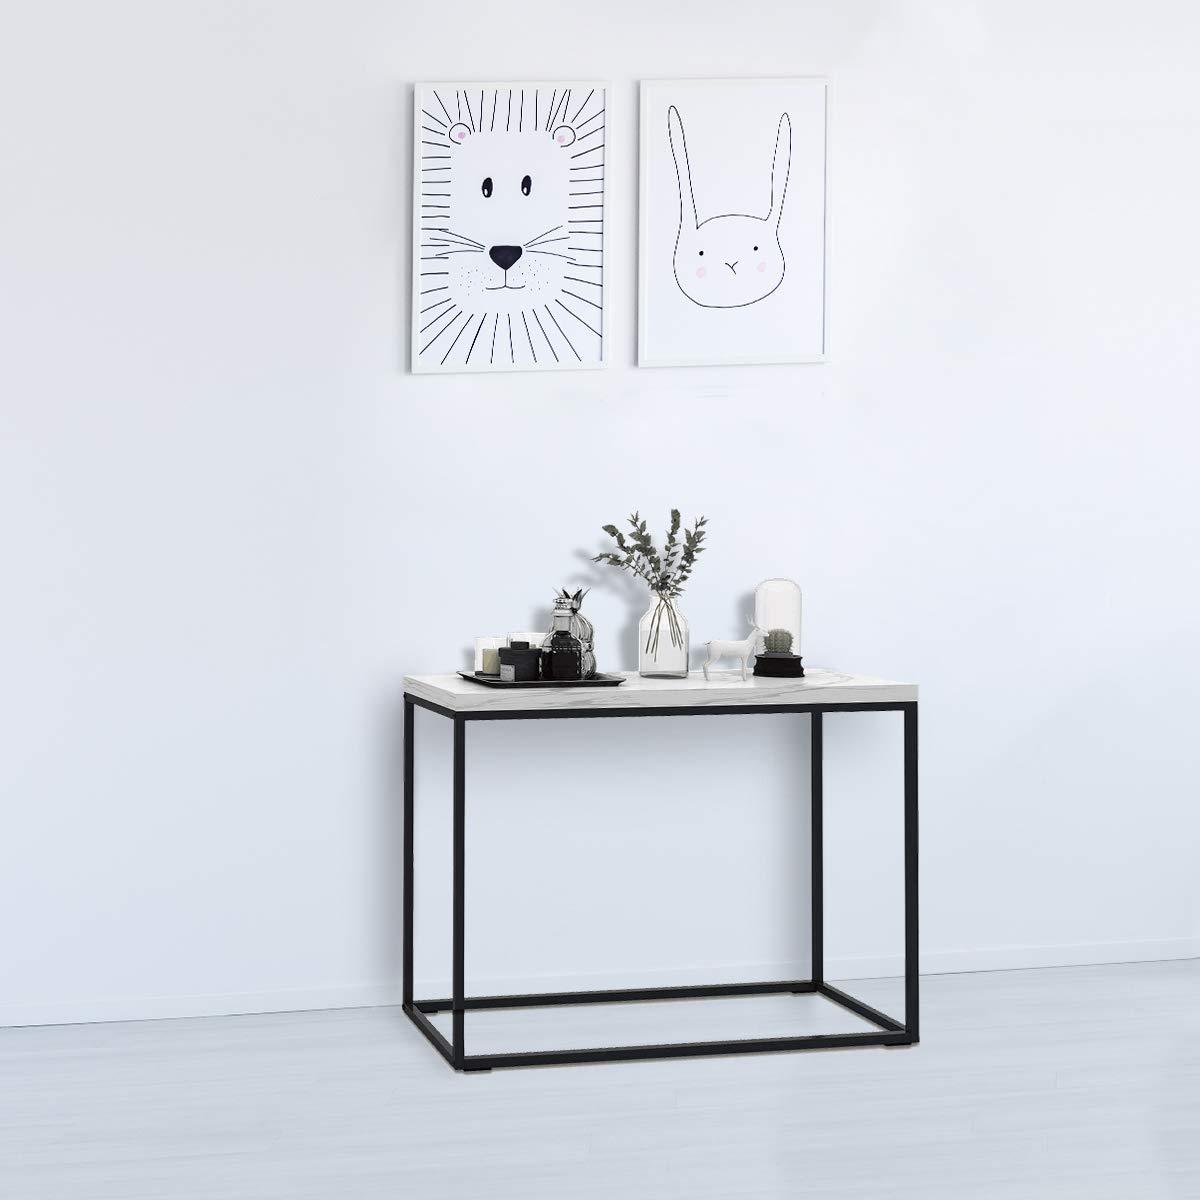 Devaise Furture Marble Side table Blanco Marble Furture 808698